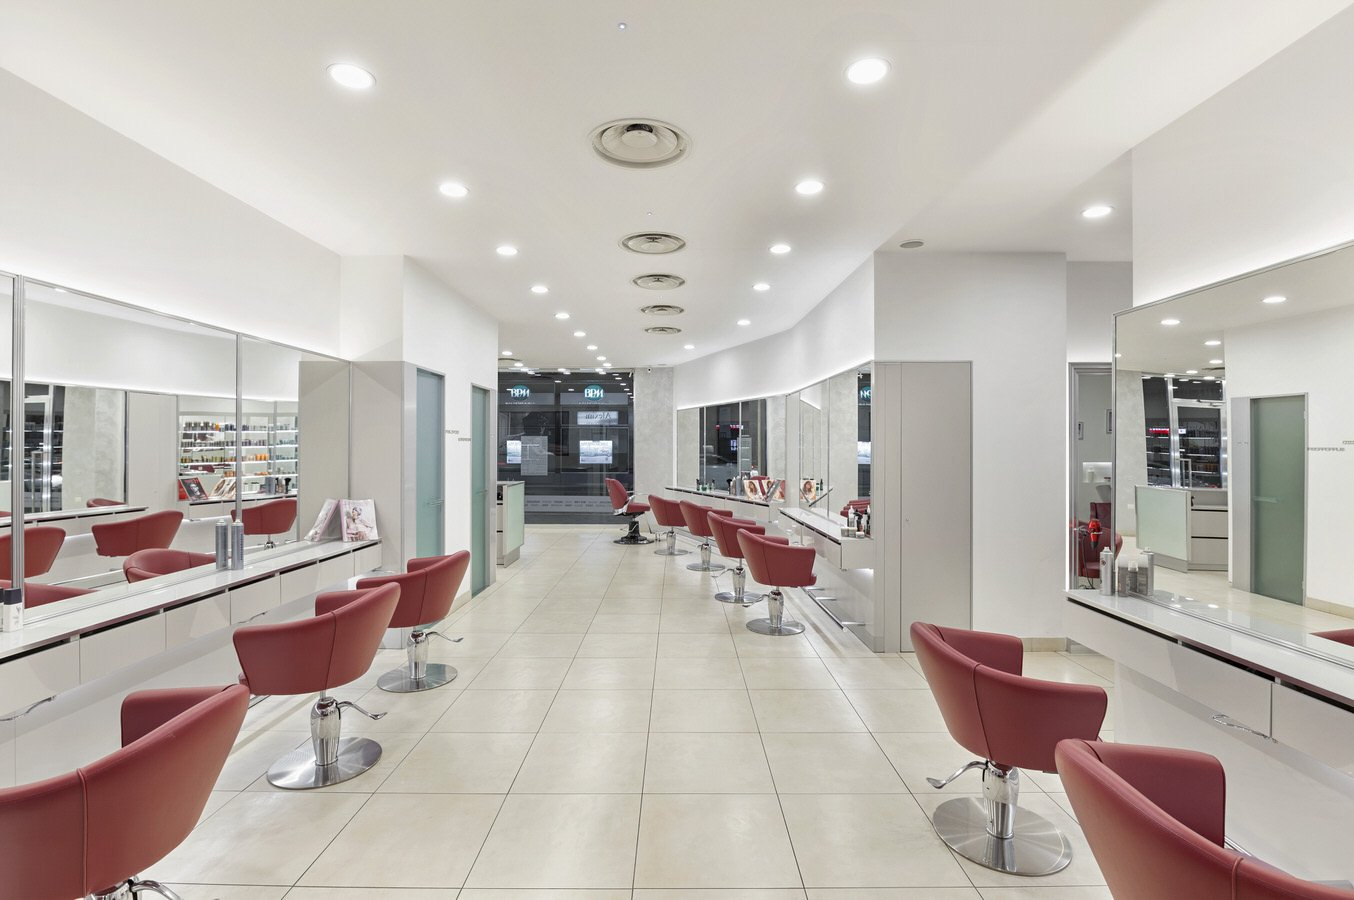 hairstylist-alexim-via-giuseppe-mazzini-16-milano-postazioni